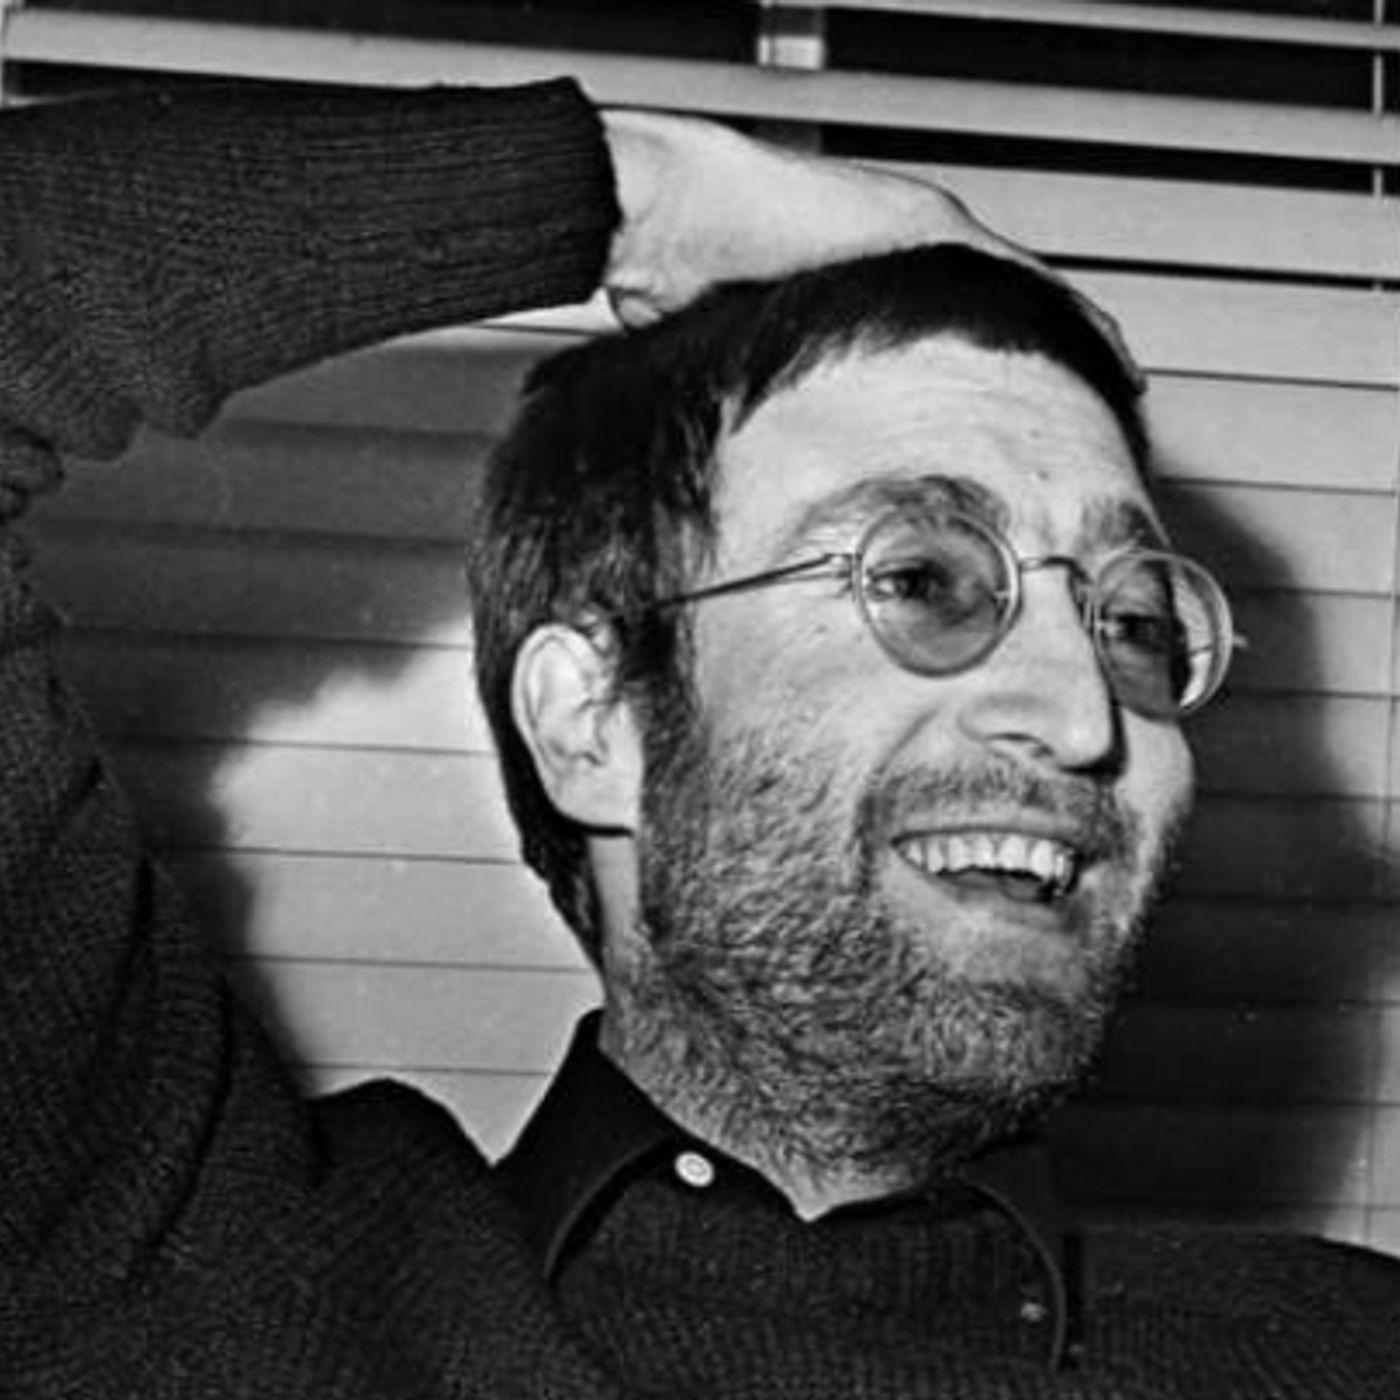 Classicos do Rock o Podcast #1344 #johnlennon #semanaLennon #Lennon81 #GnFnR #avengers #whatif #scream #wearamask #washyorhands #eternals